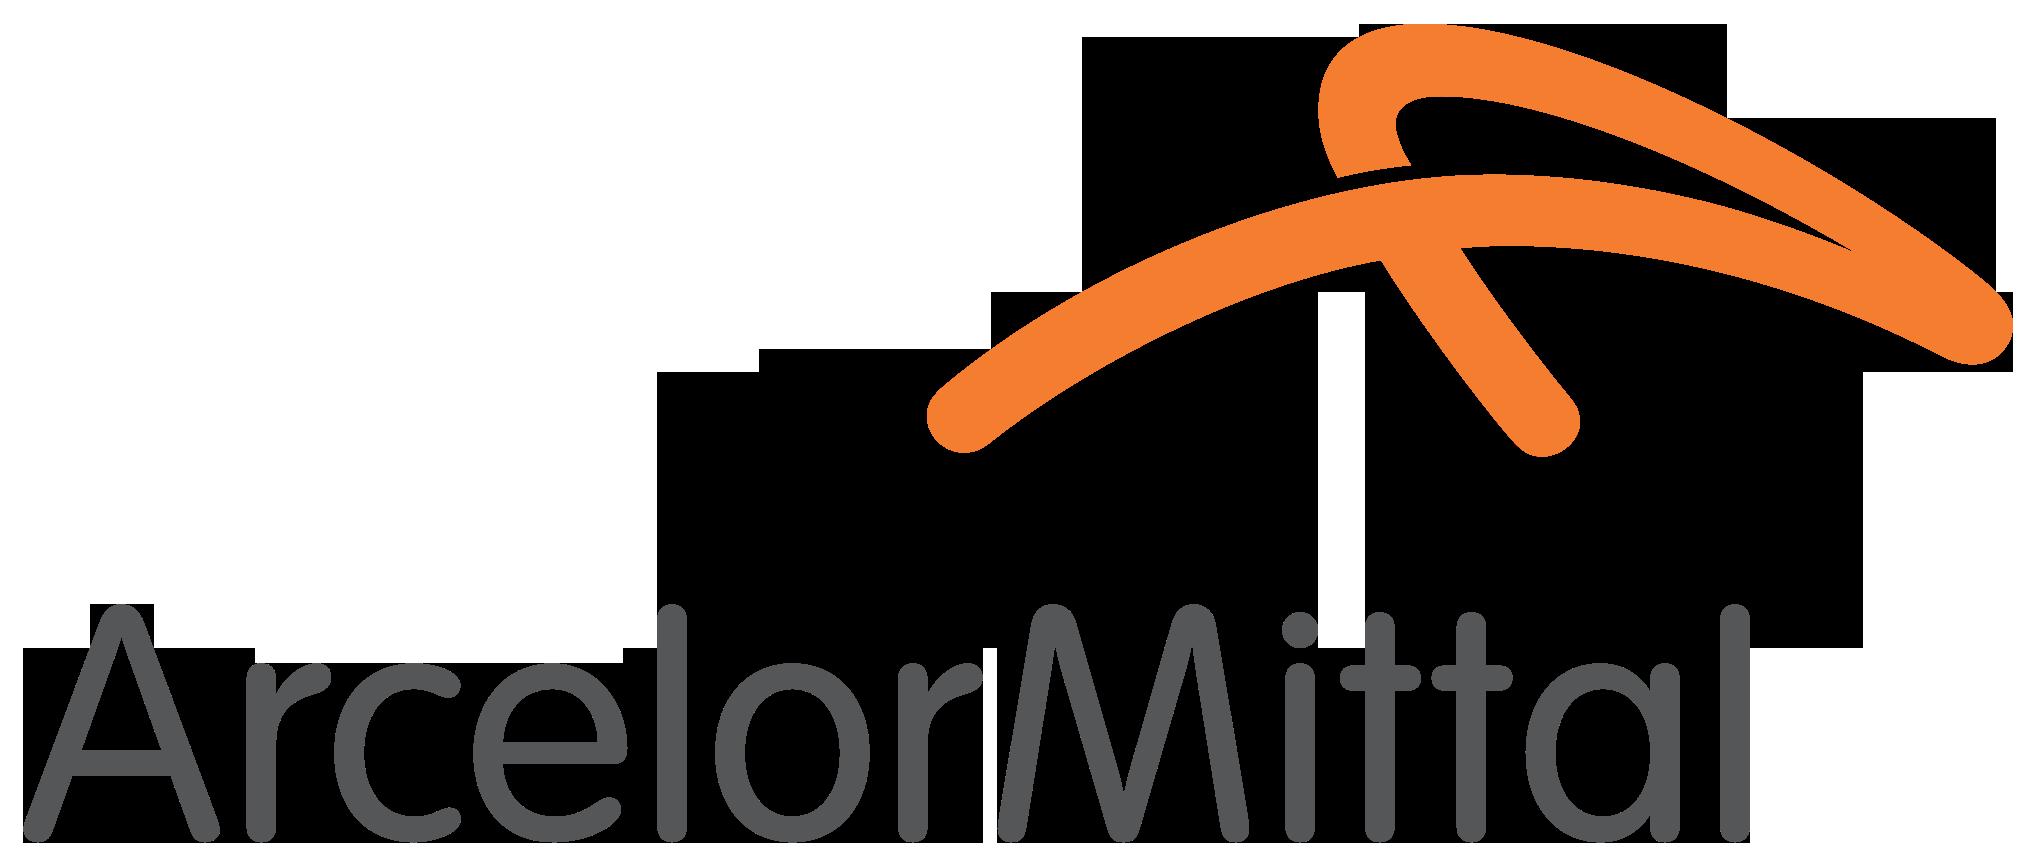 ArcelorMittal company logo